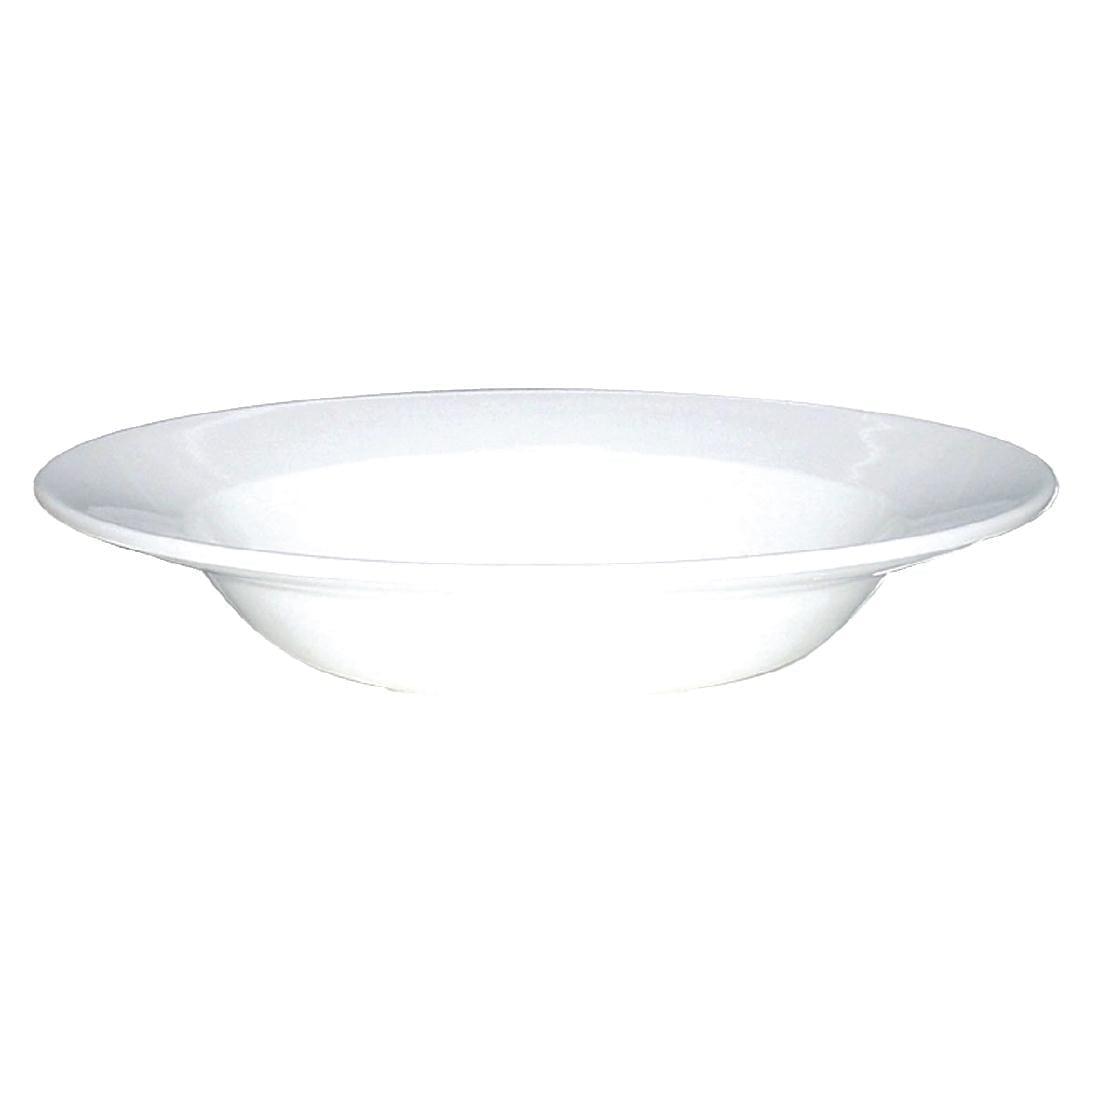 "Alchemy White Rimmed Soup Bowl - 9 1/2"" (Box 12)-0"